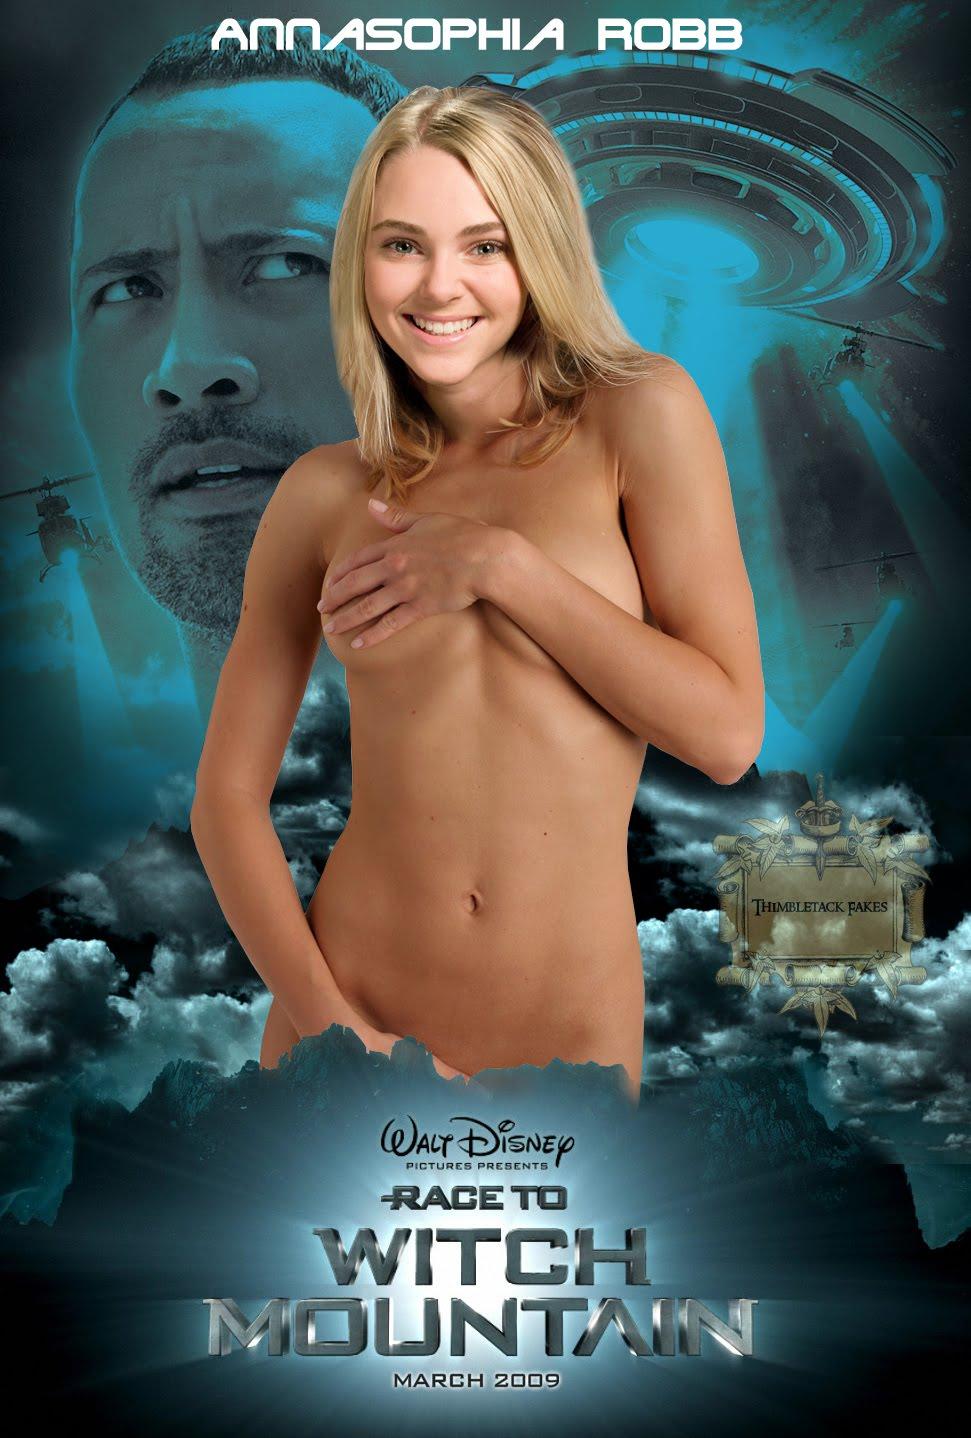 Annasophia Robb Nude Fakes